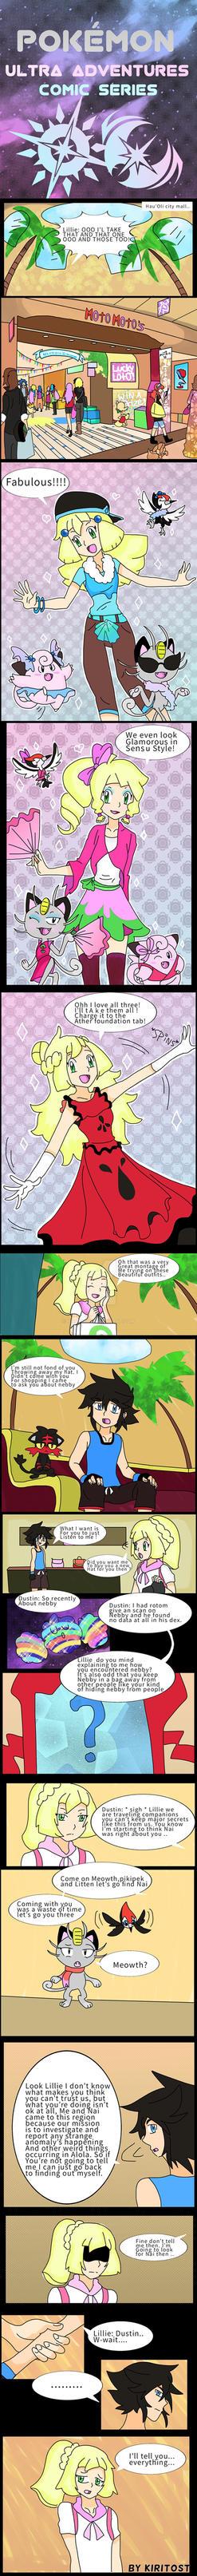 Pokemon Ultra Adevtures Comic Chapter2 pg.21